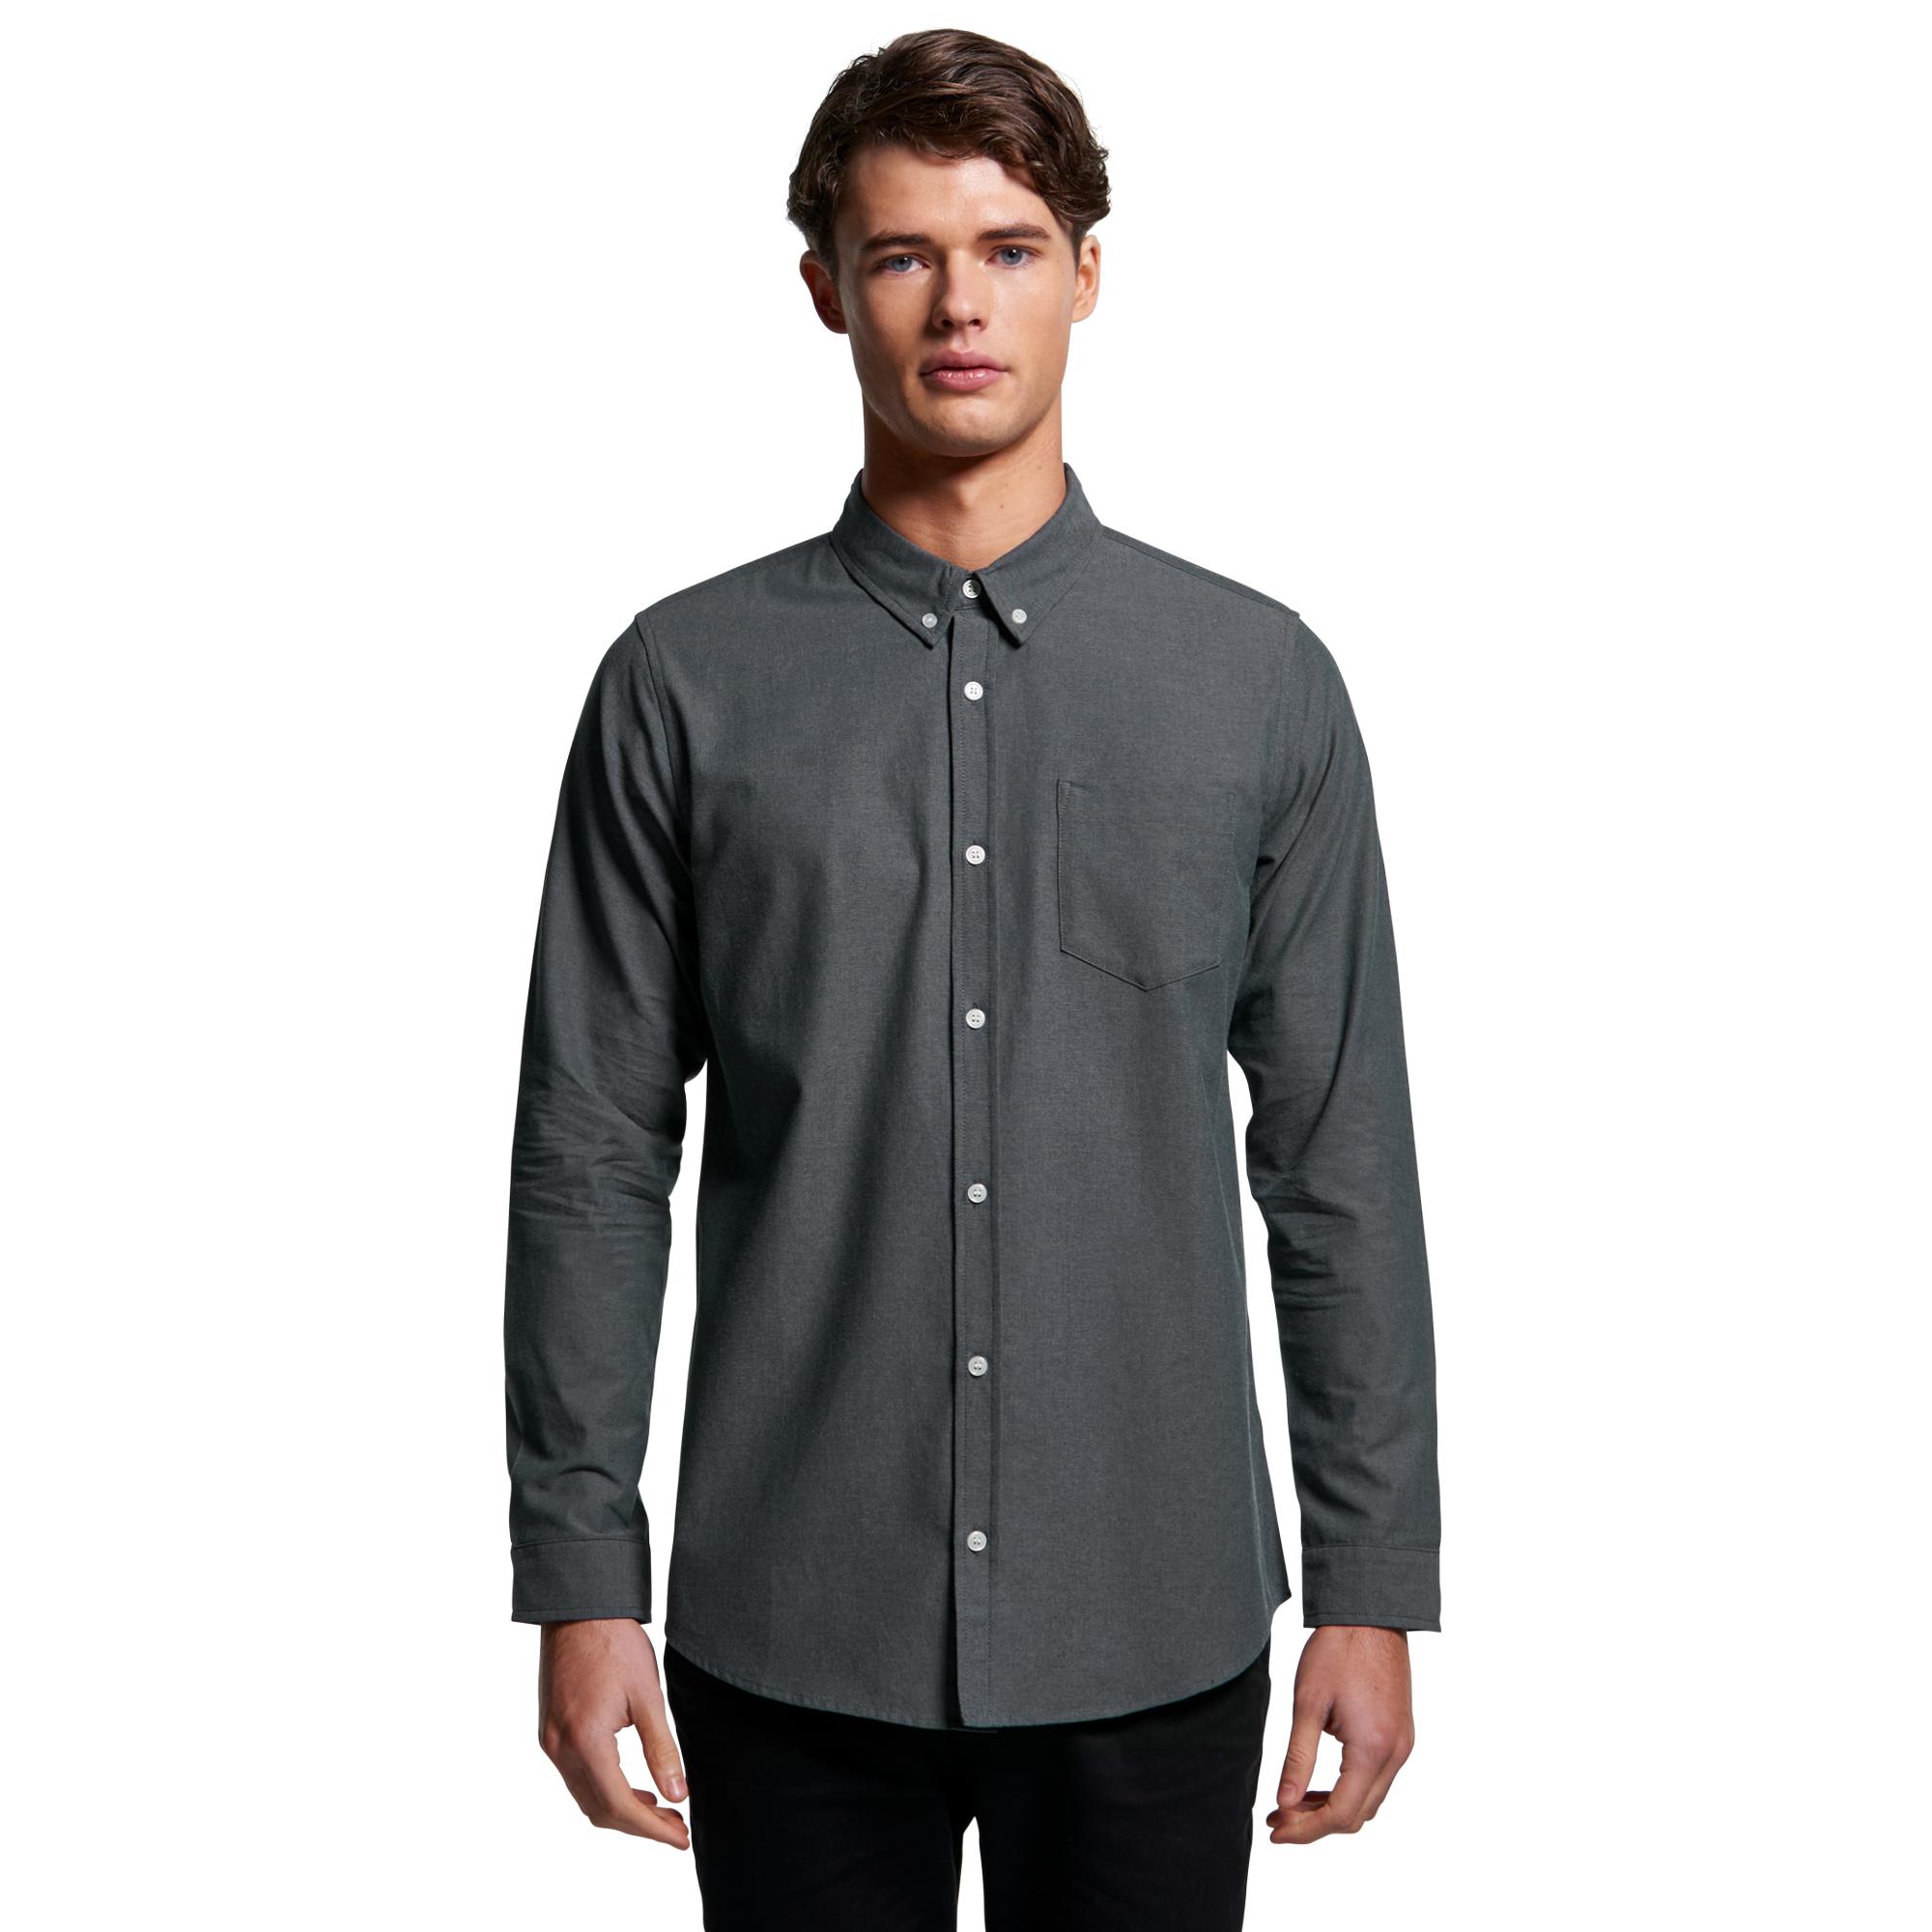 AS Colour Chambray Shirt